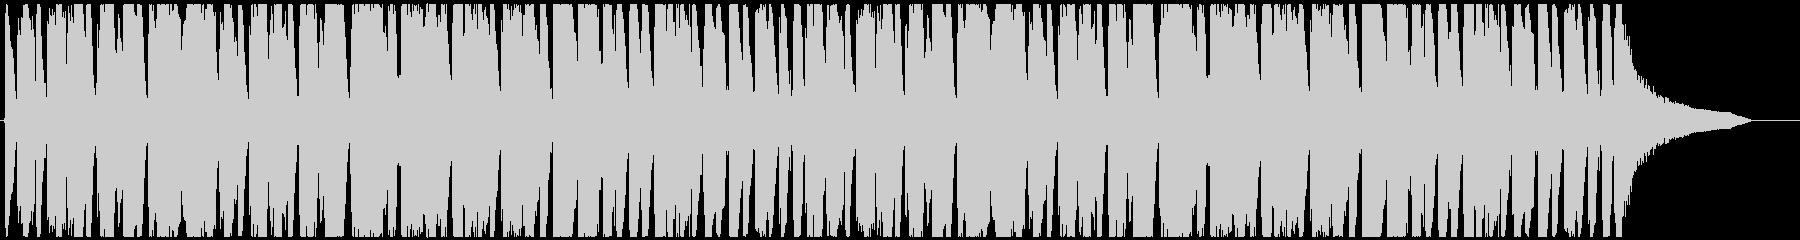 CM ホンキートンクピアノのカントリー1の未再生の波形